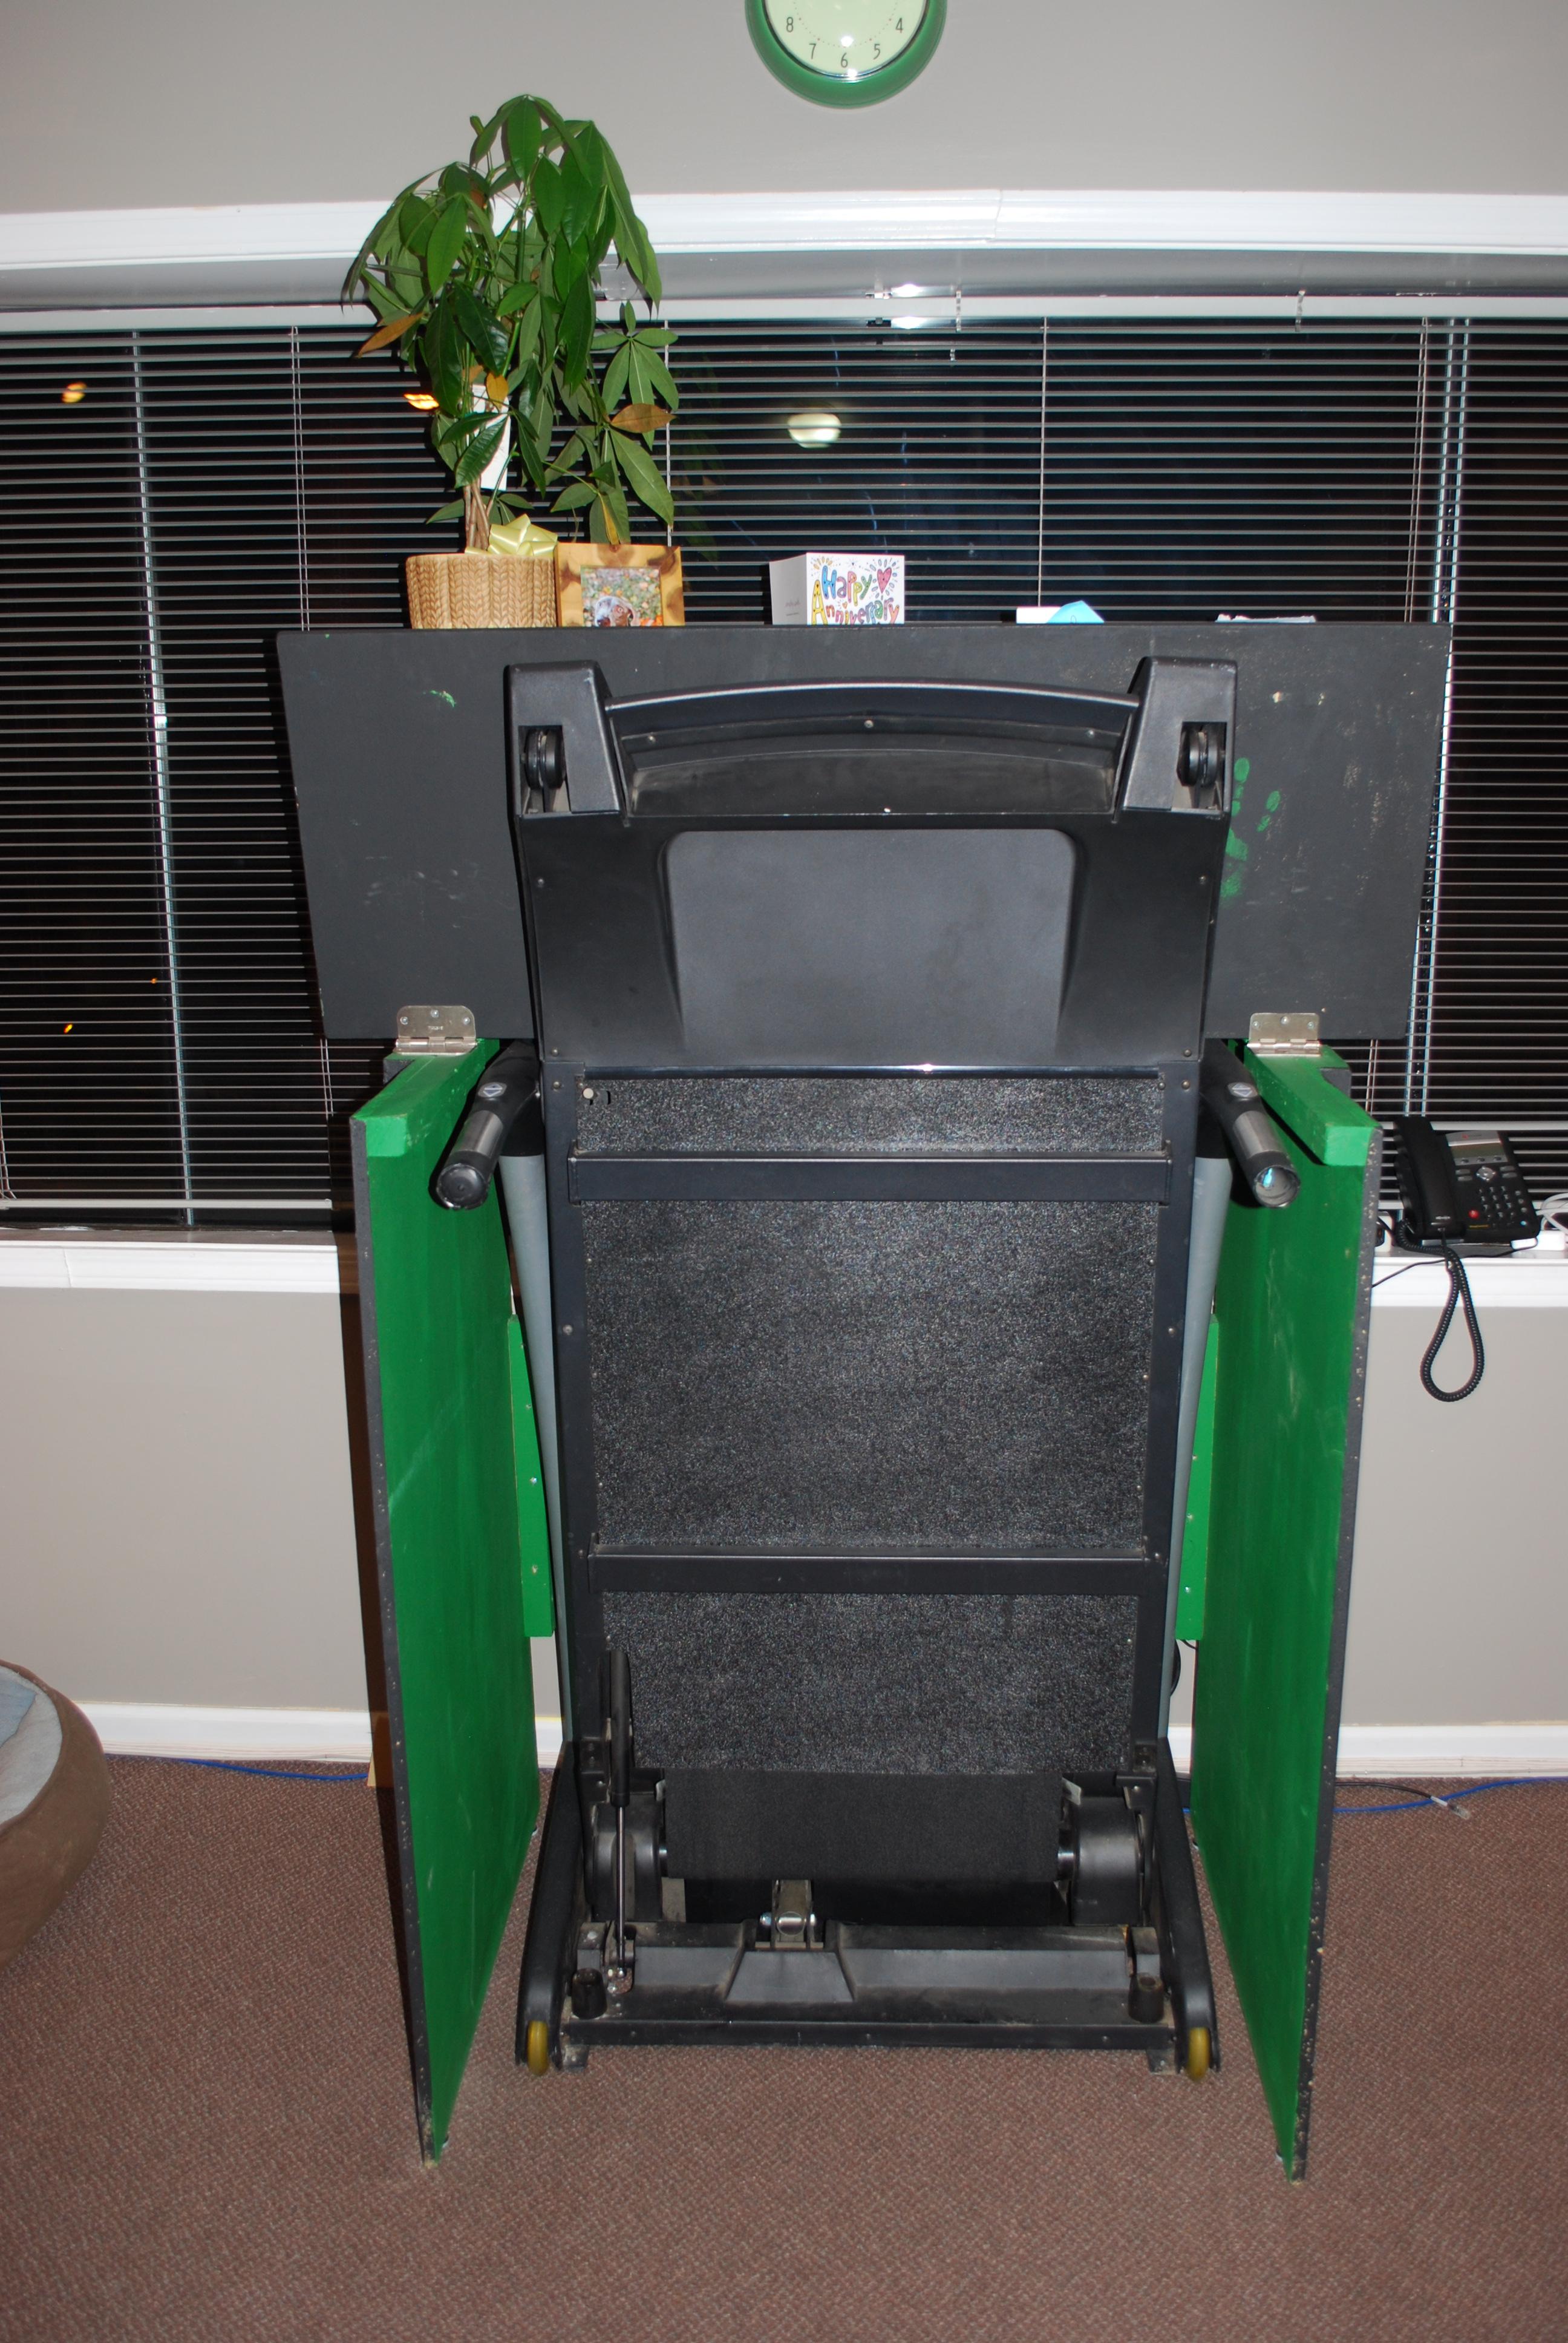 Building A Desk Treadmill A Love Story Huffpost